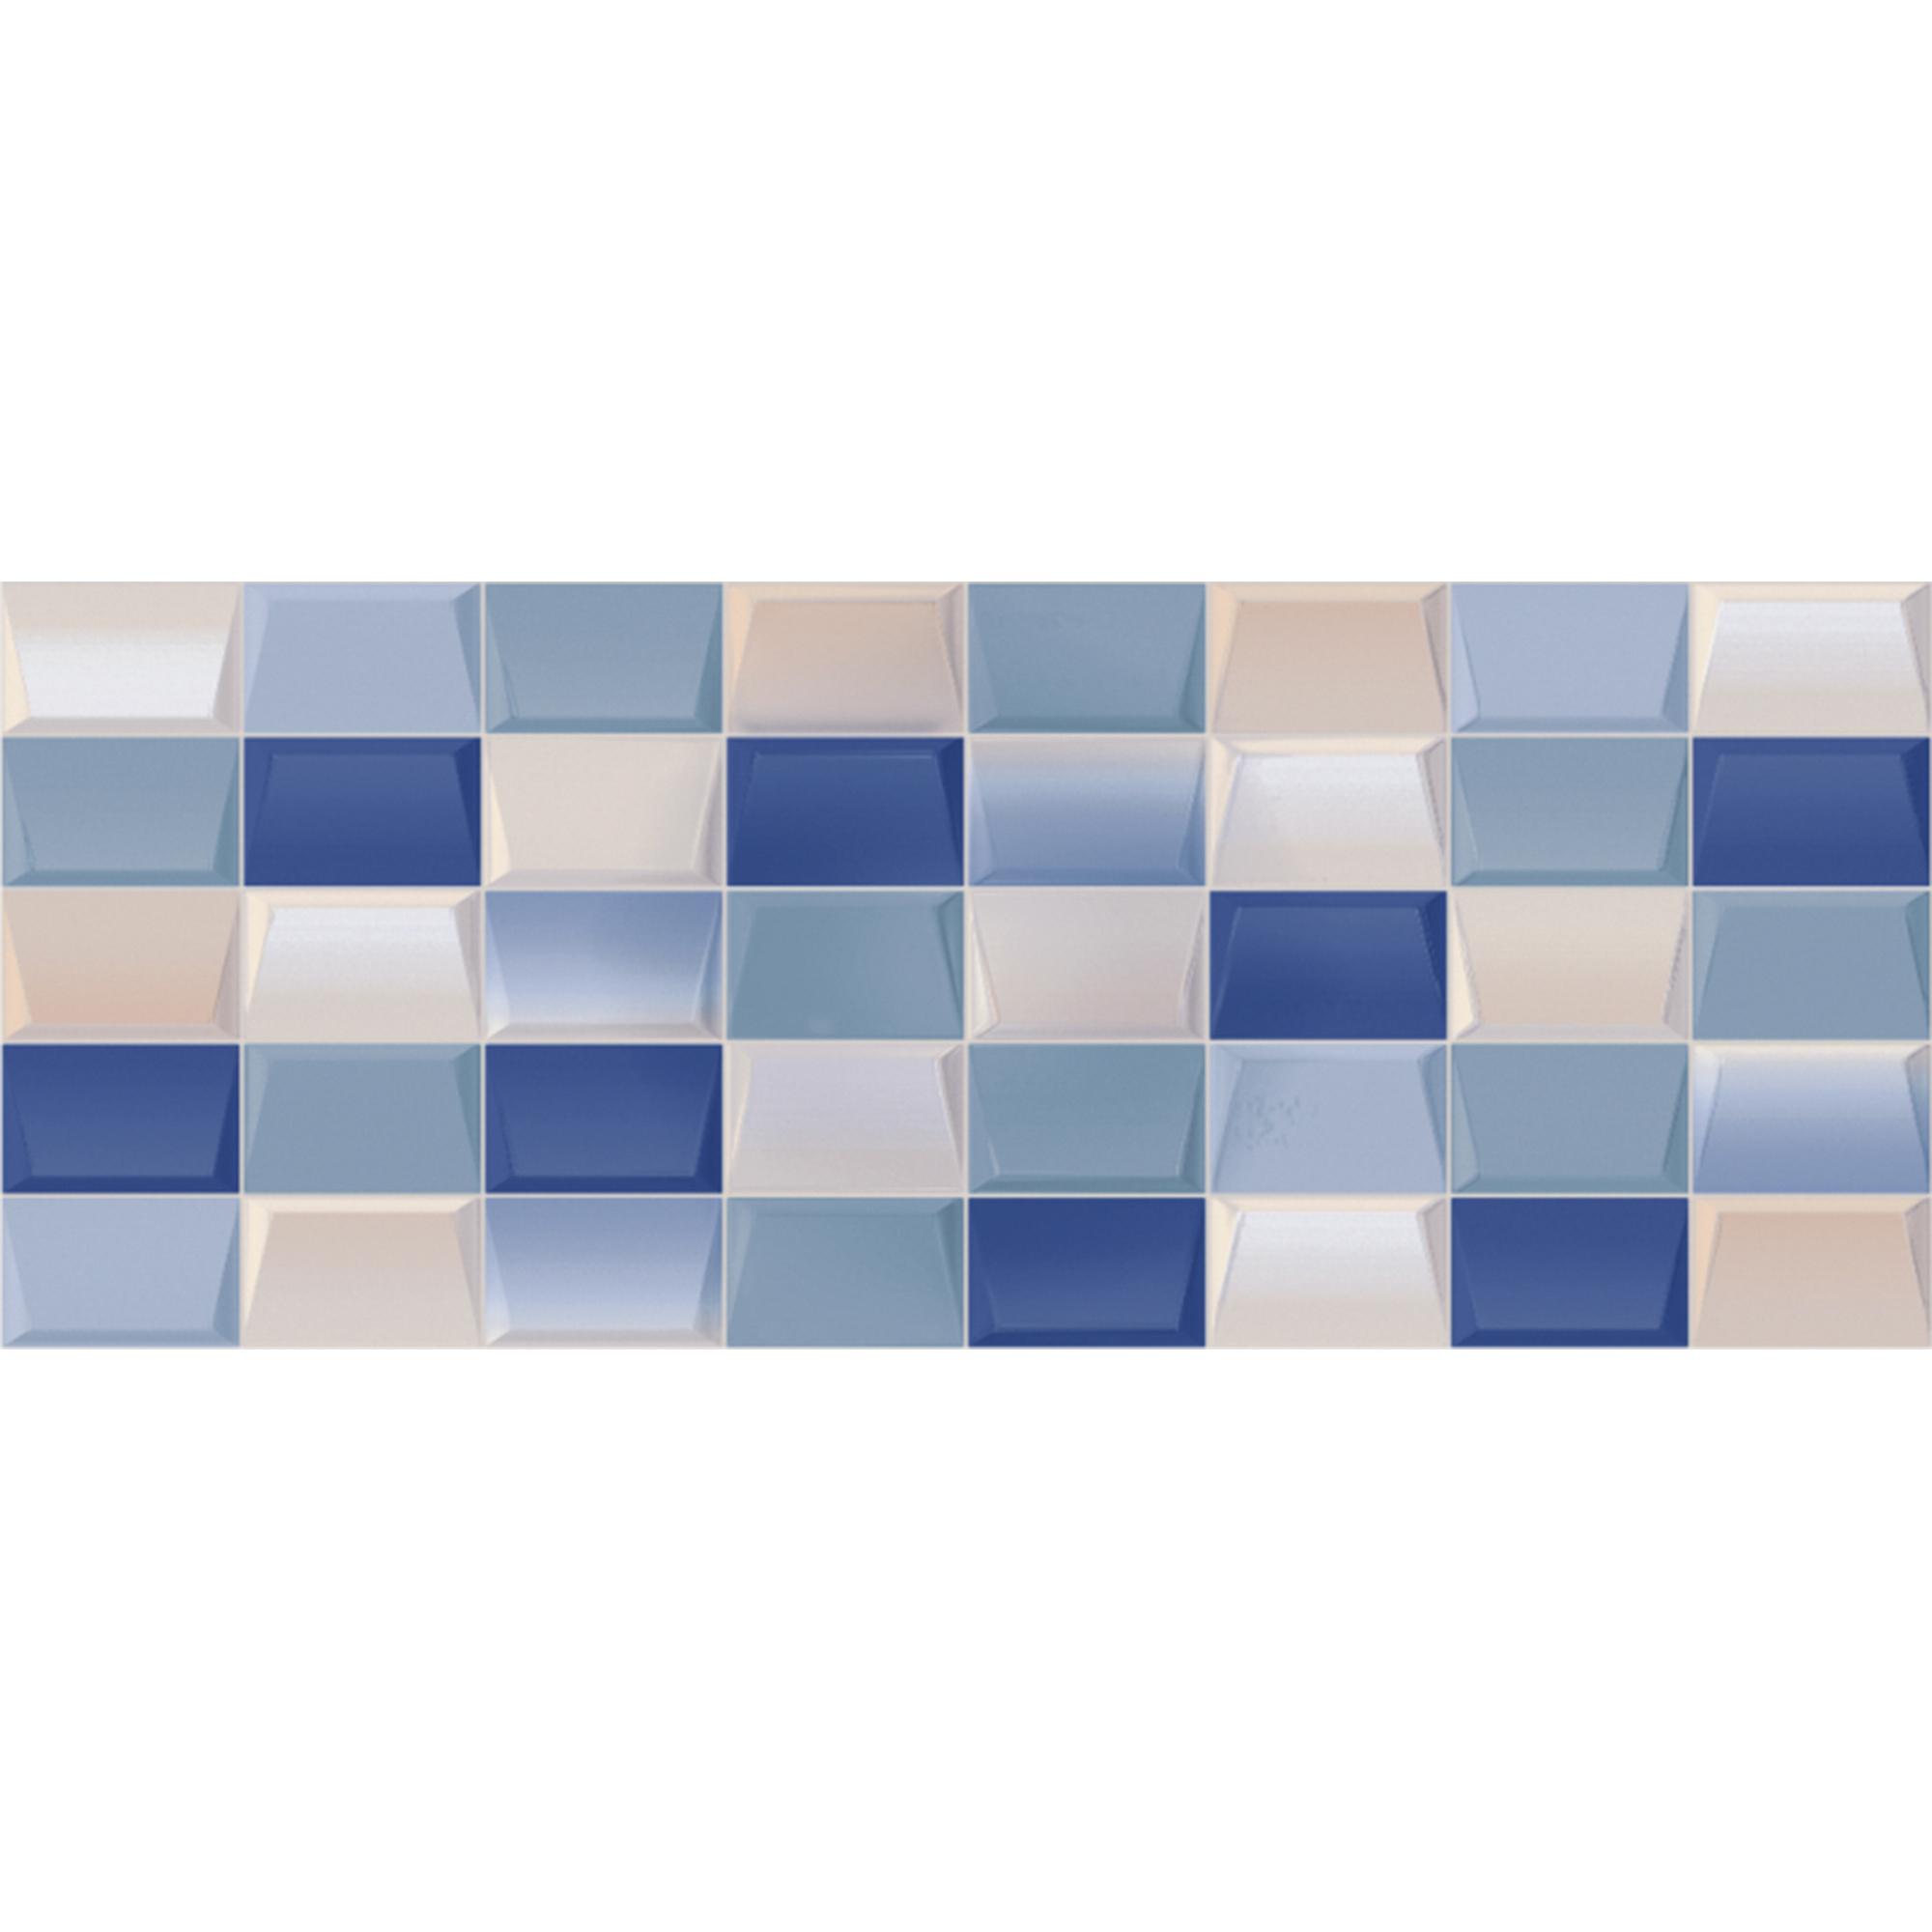 Плитка Kerlife Elissa Blu Mosaico 20,1x50,5 см настенная плитка kerlife stella blu 1c 31 5x63